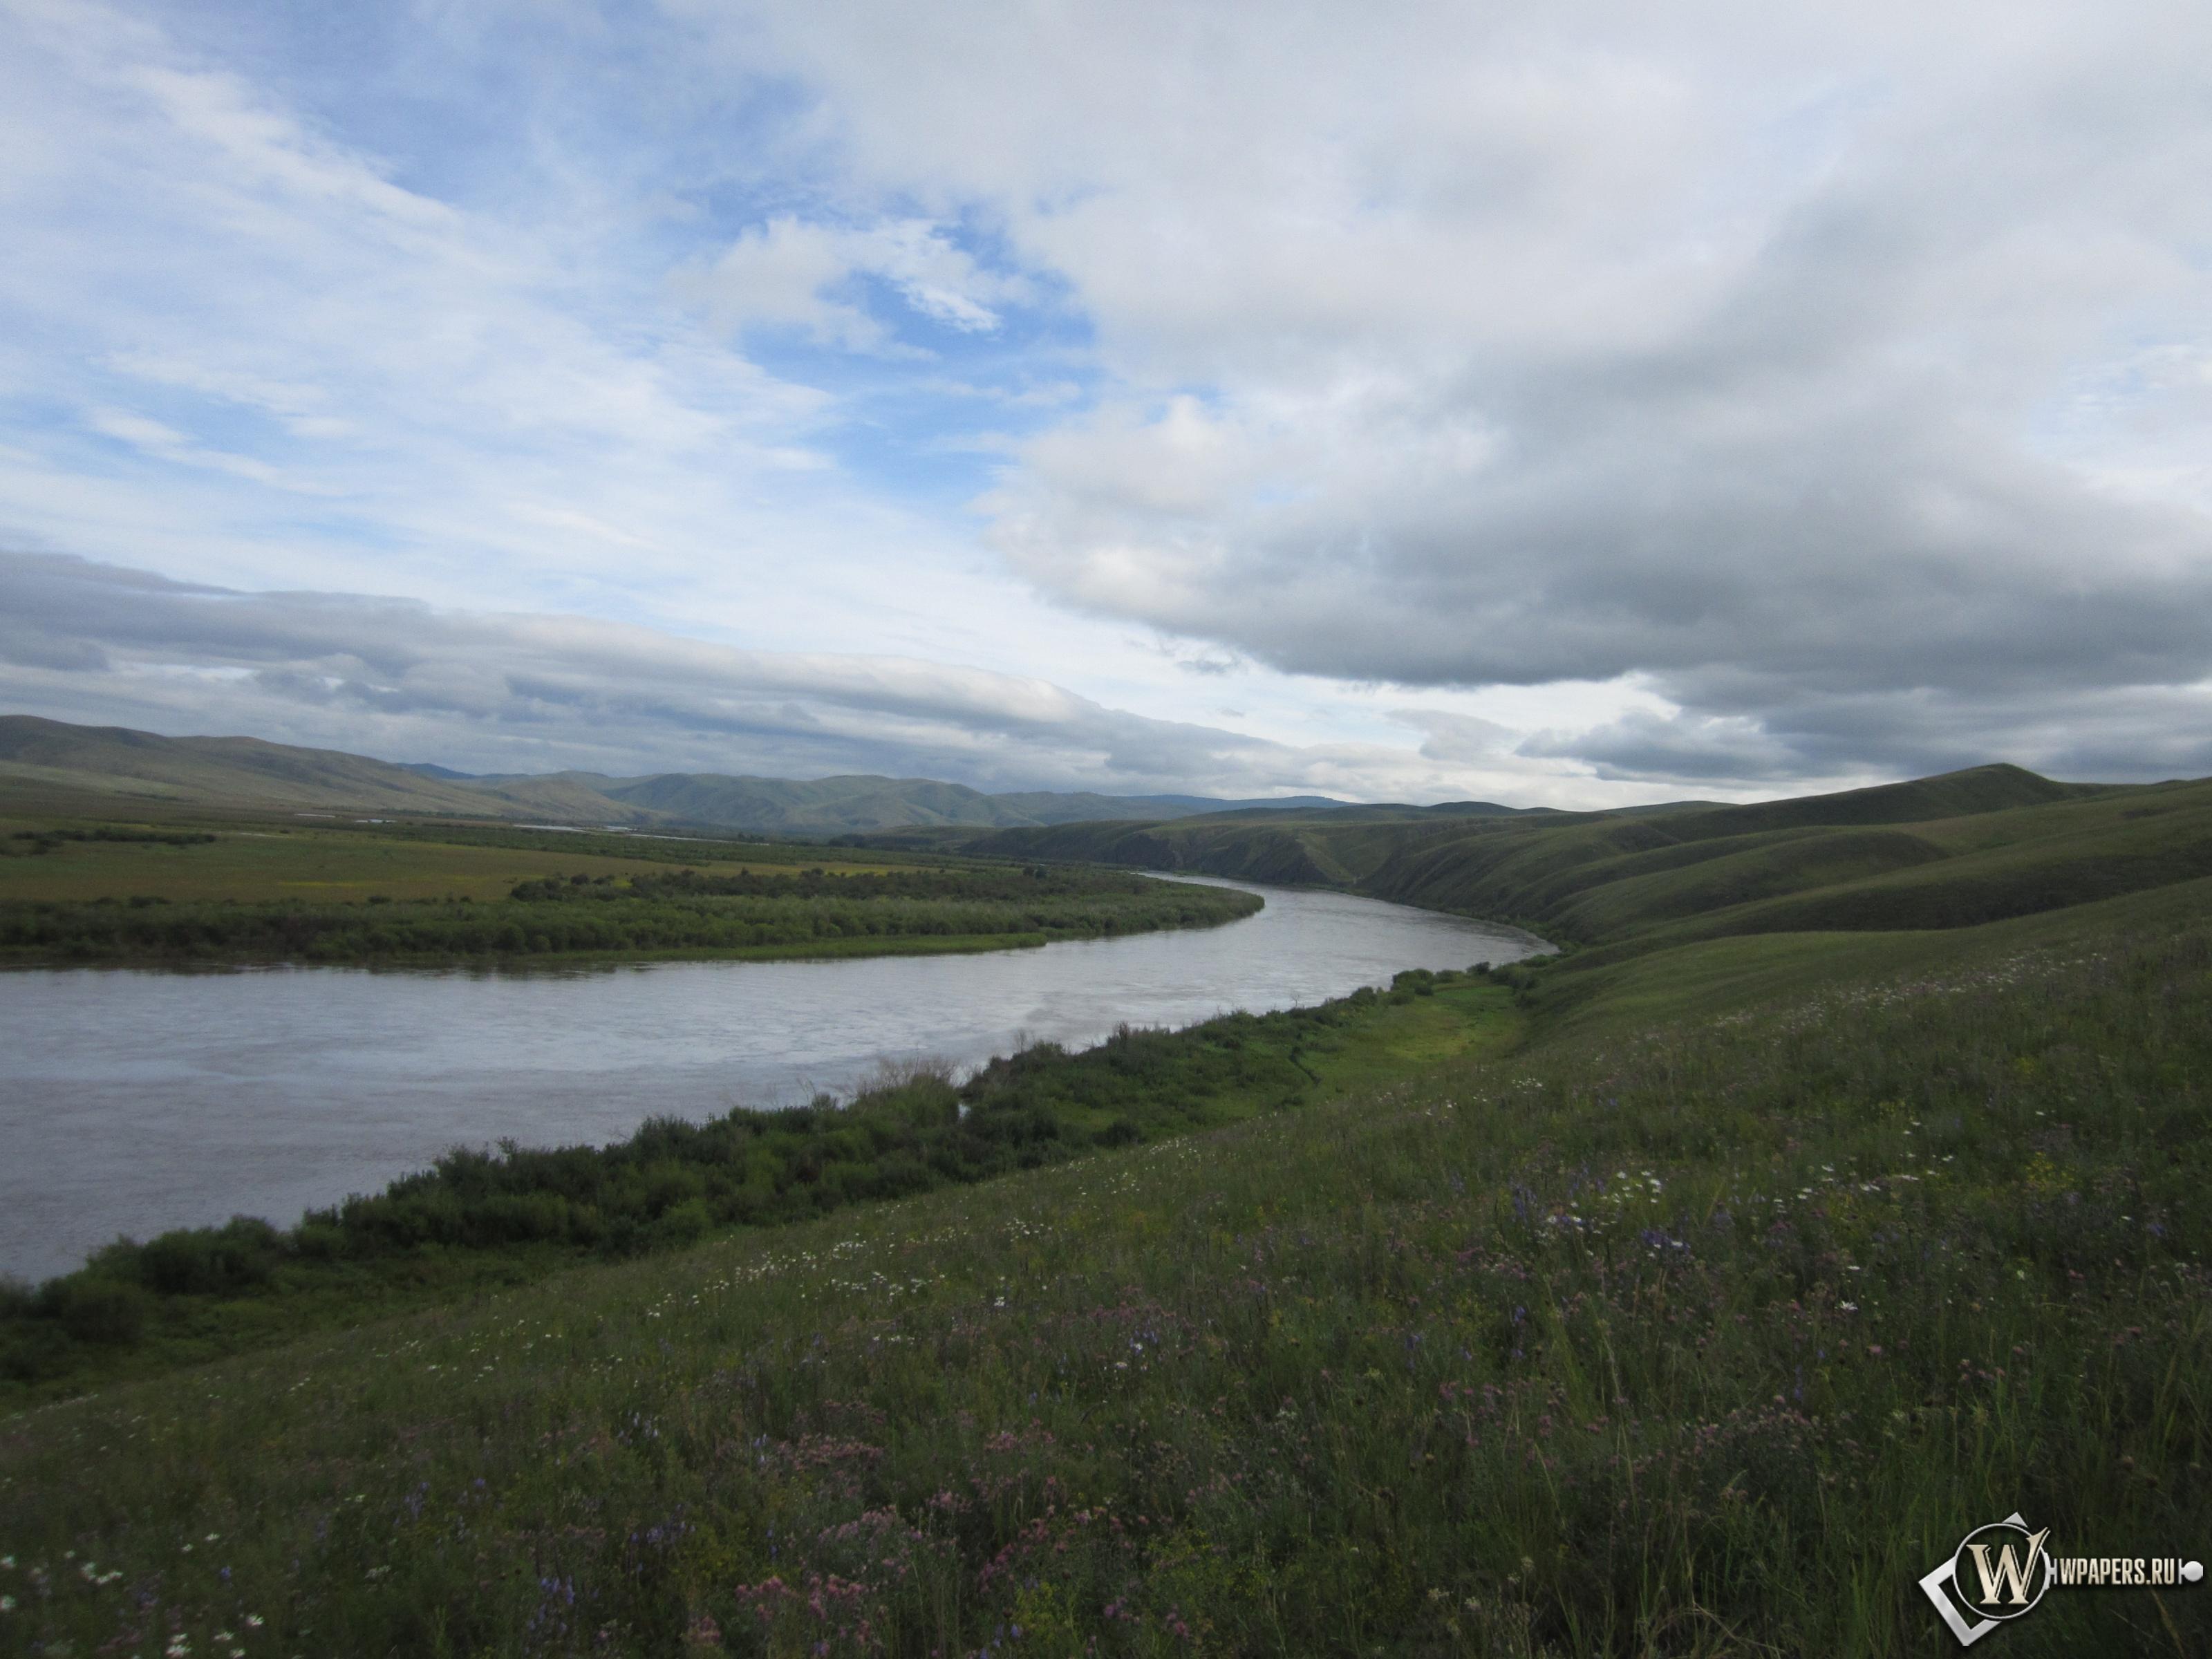 Забайкалье река Онон 3200x2400